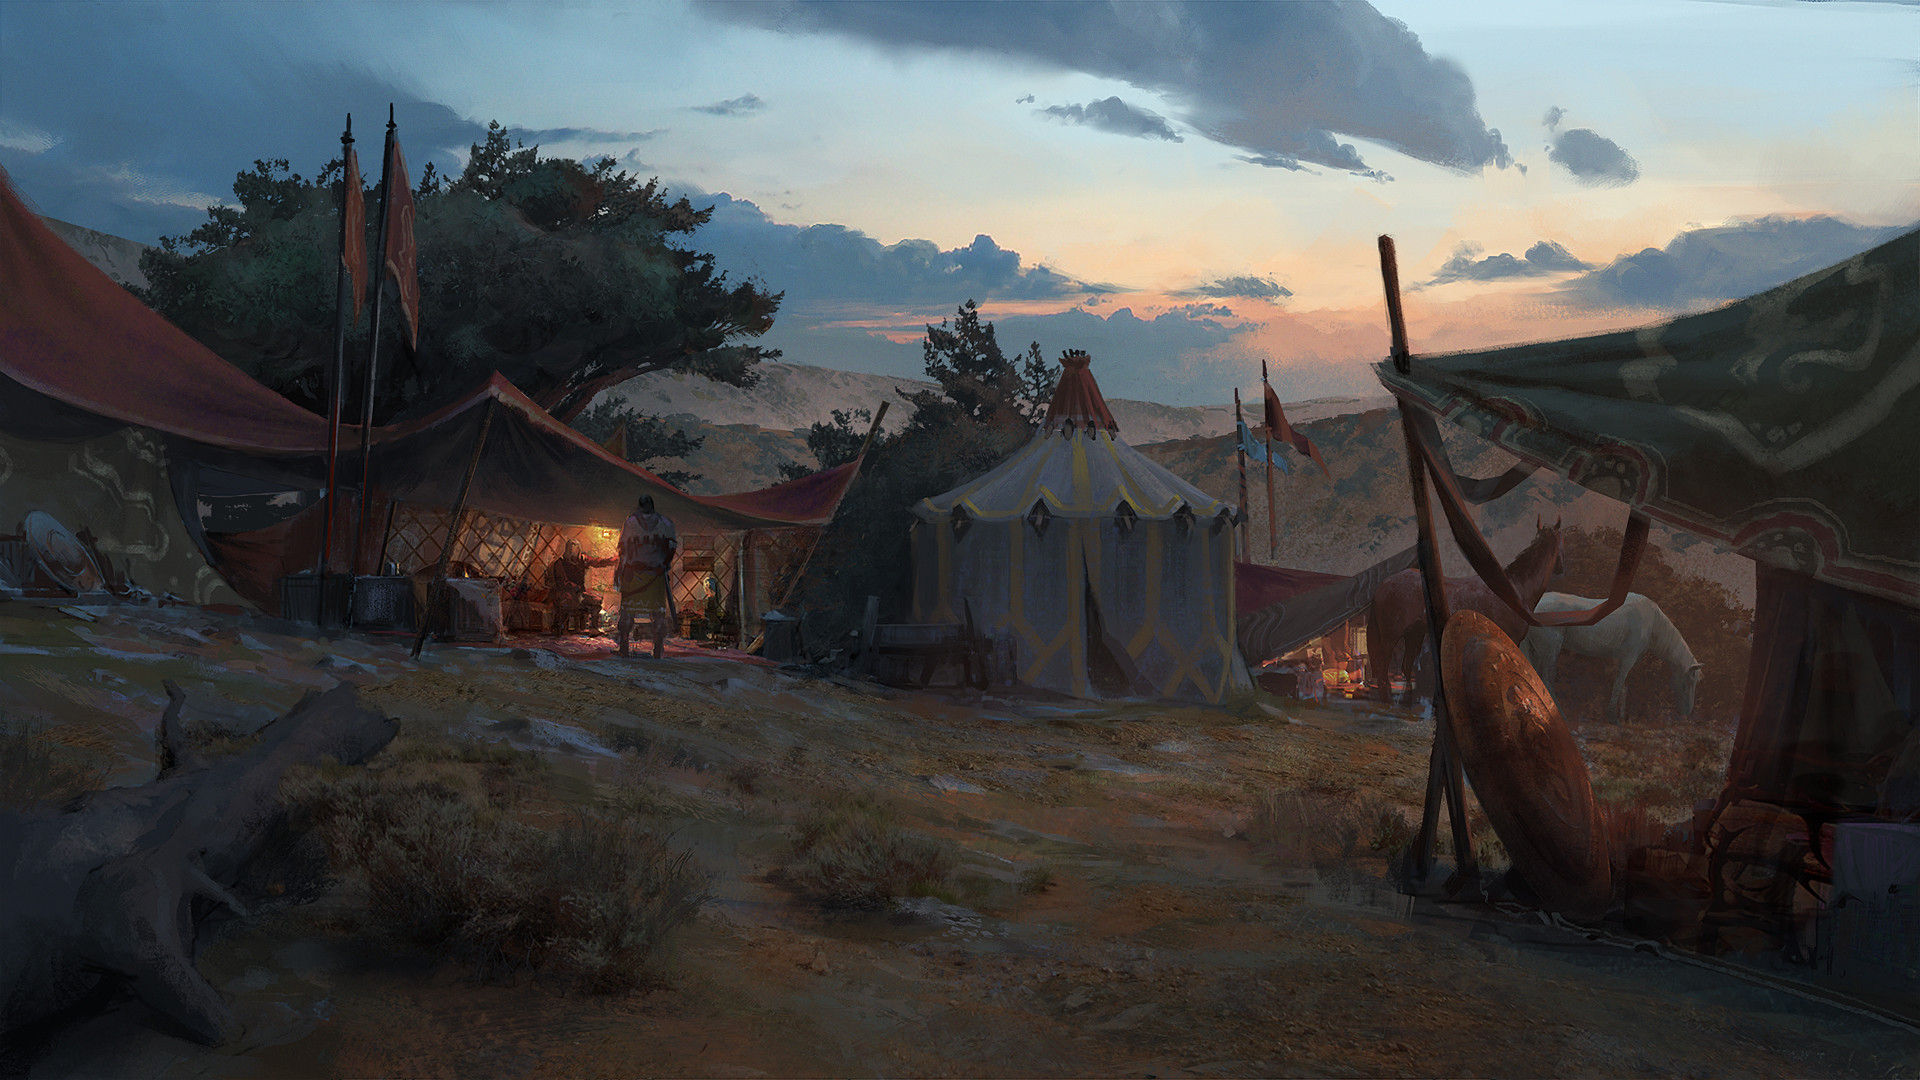 Klaus pillon camp dusk savannah final